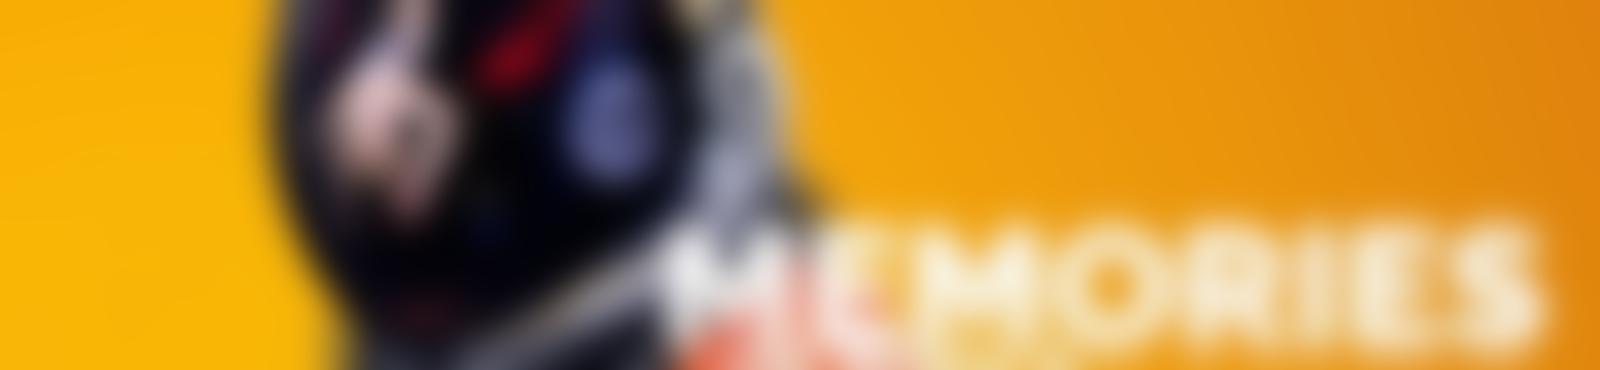 Blurred 5fc11362 bfe1 4edc 8d7a d50568147faf